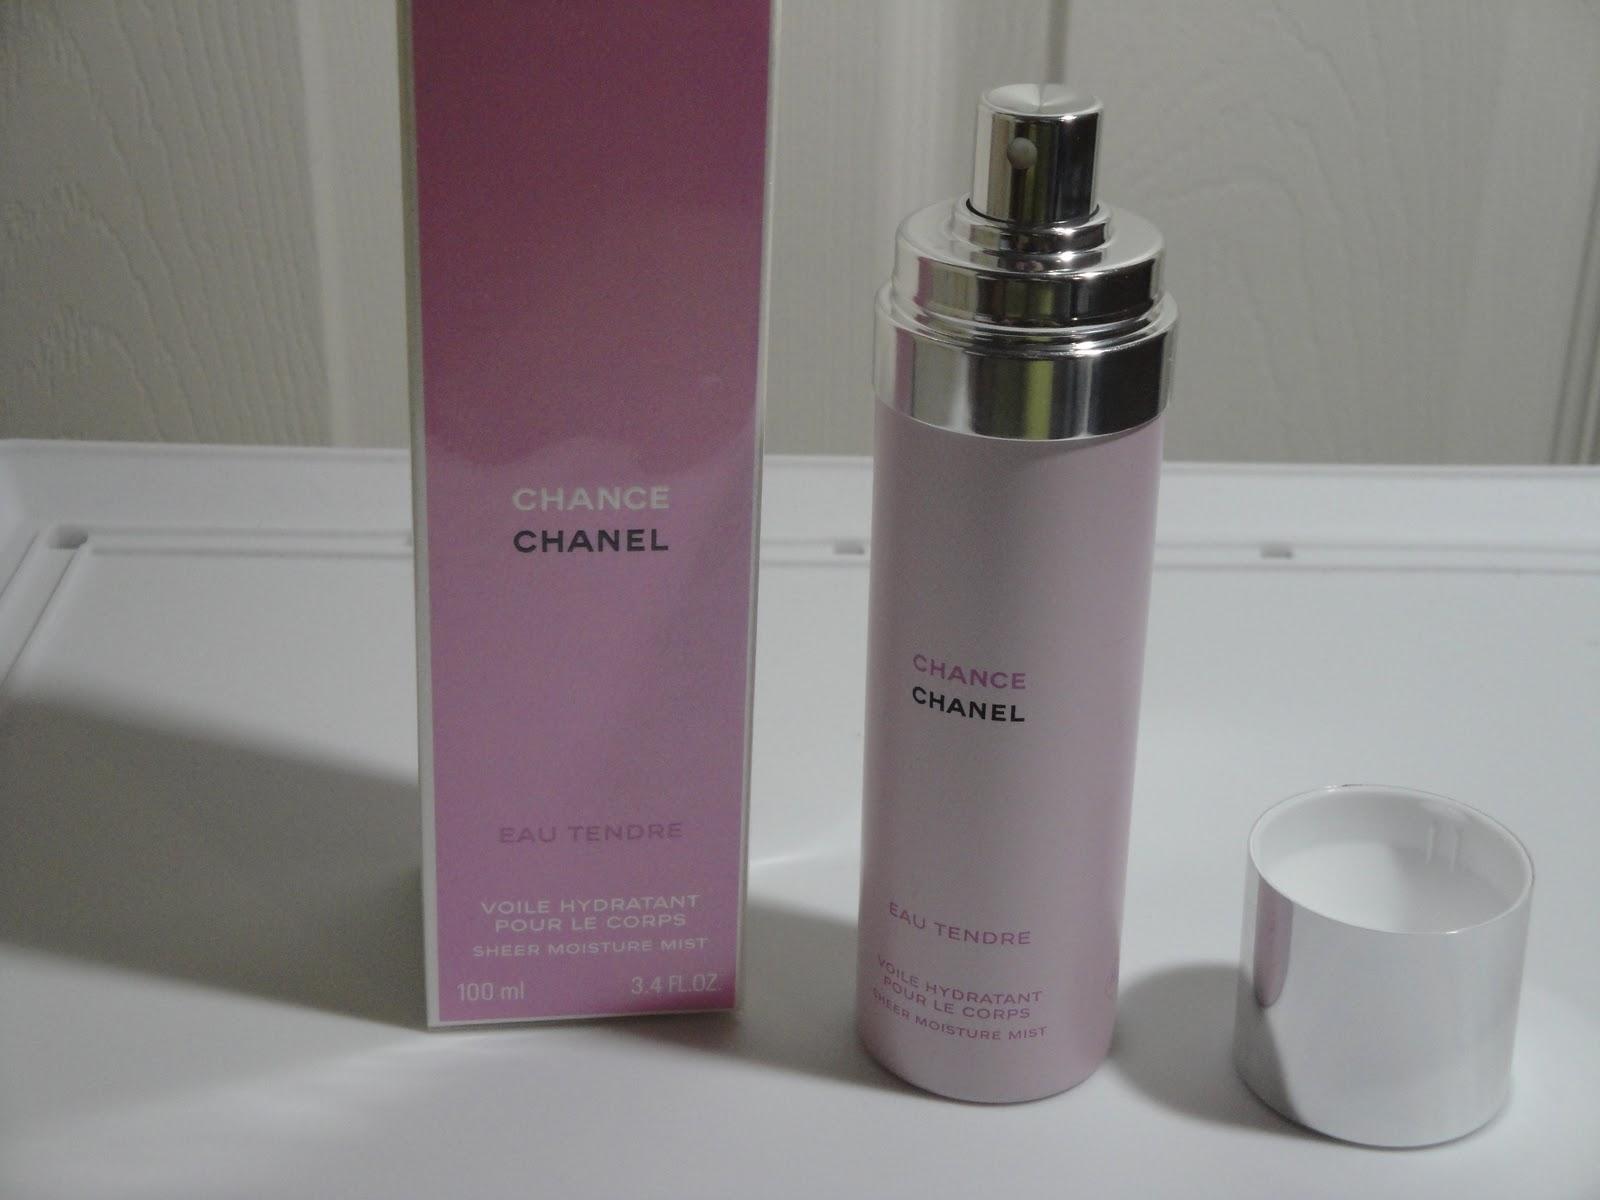 bc725990 Jayded Dreaming Beauty Blog : CHANEL: CHANCE EAU TENDRE SHEER ...